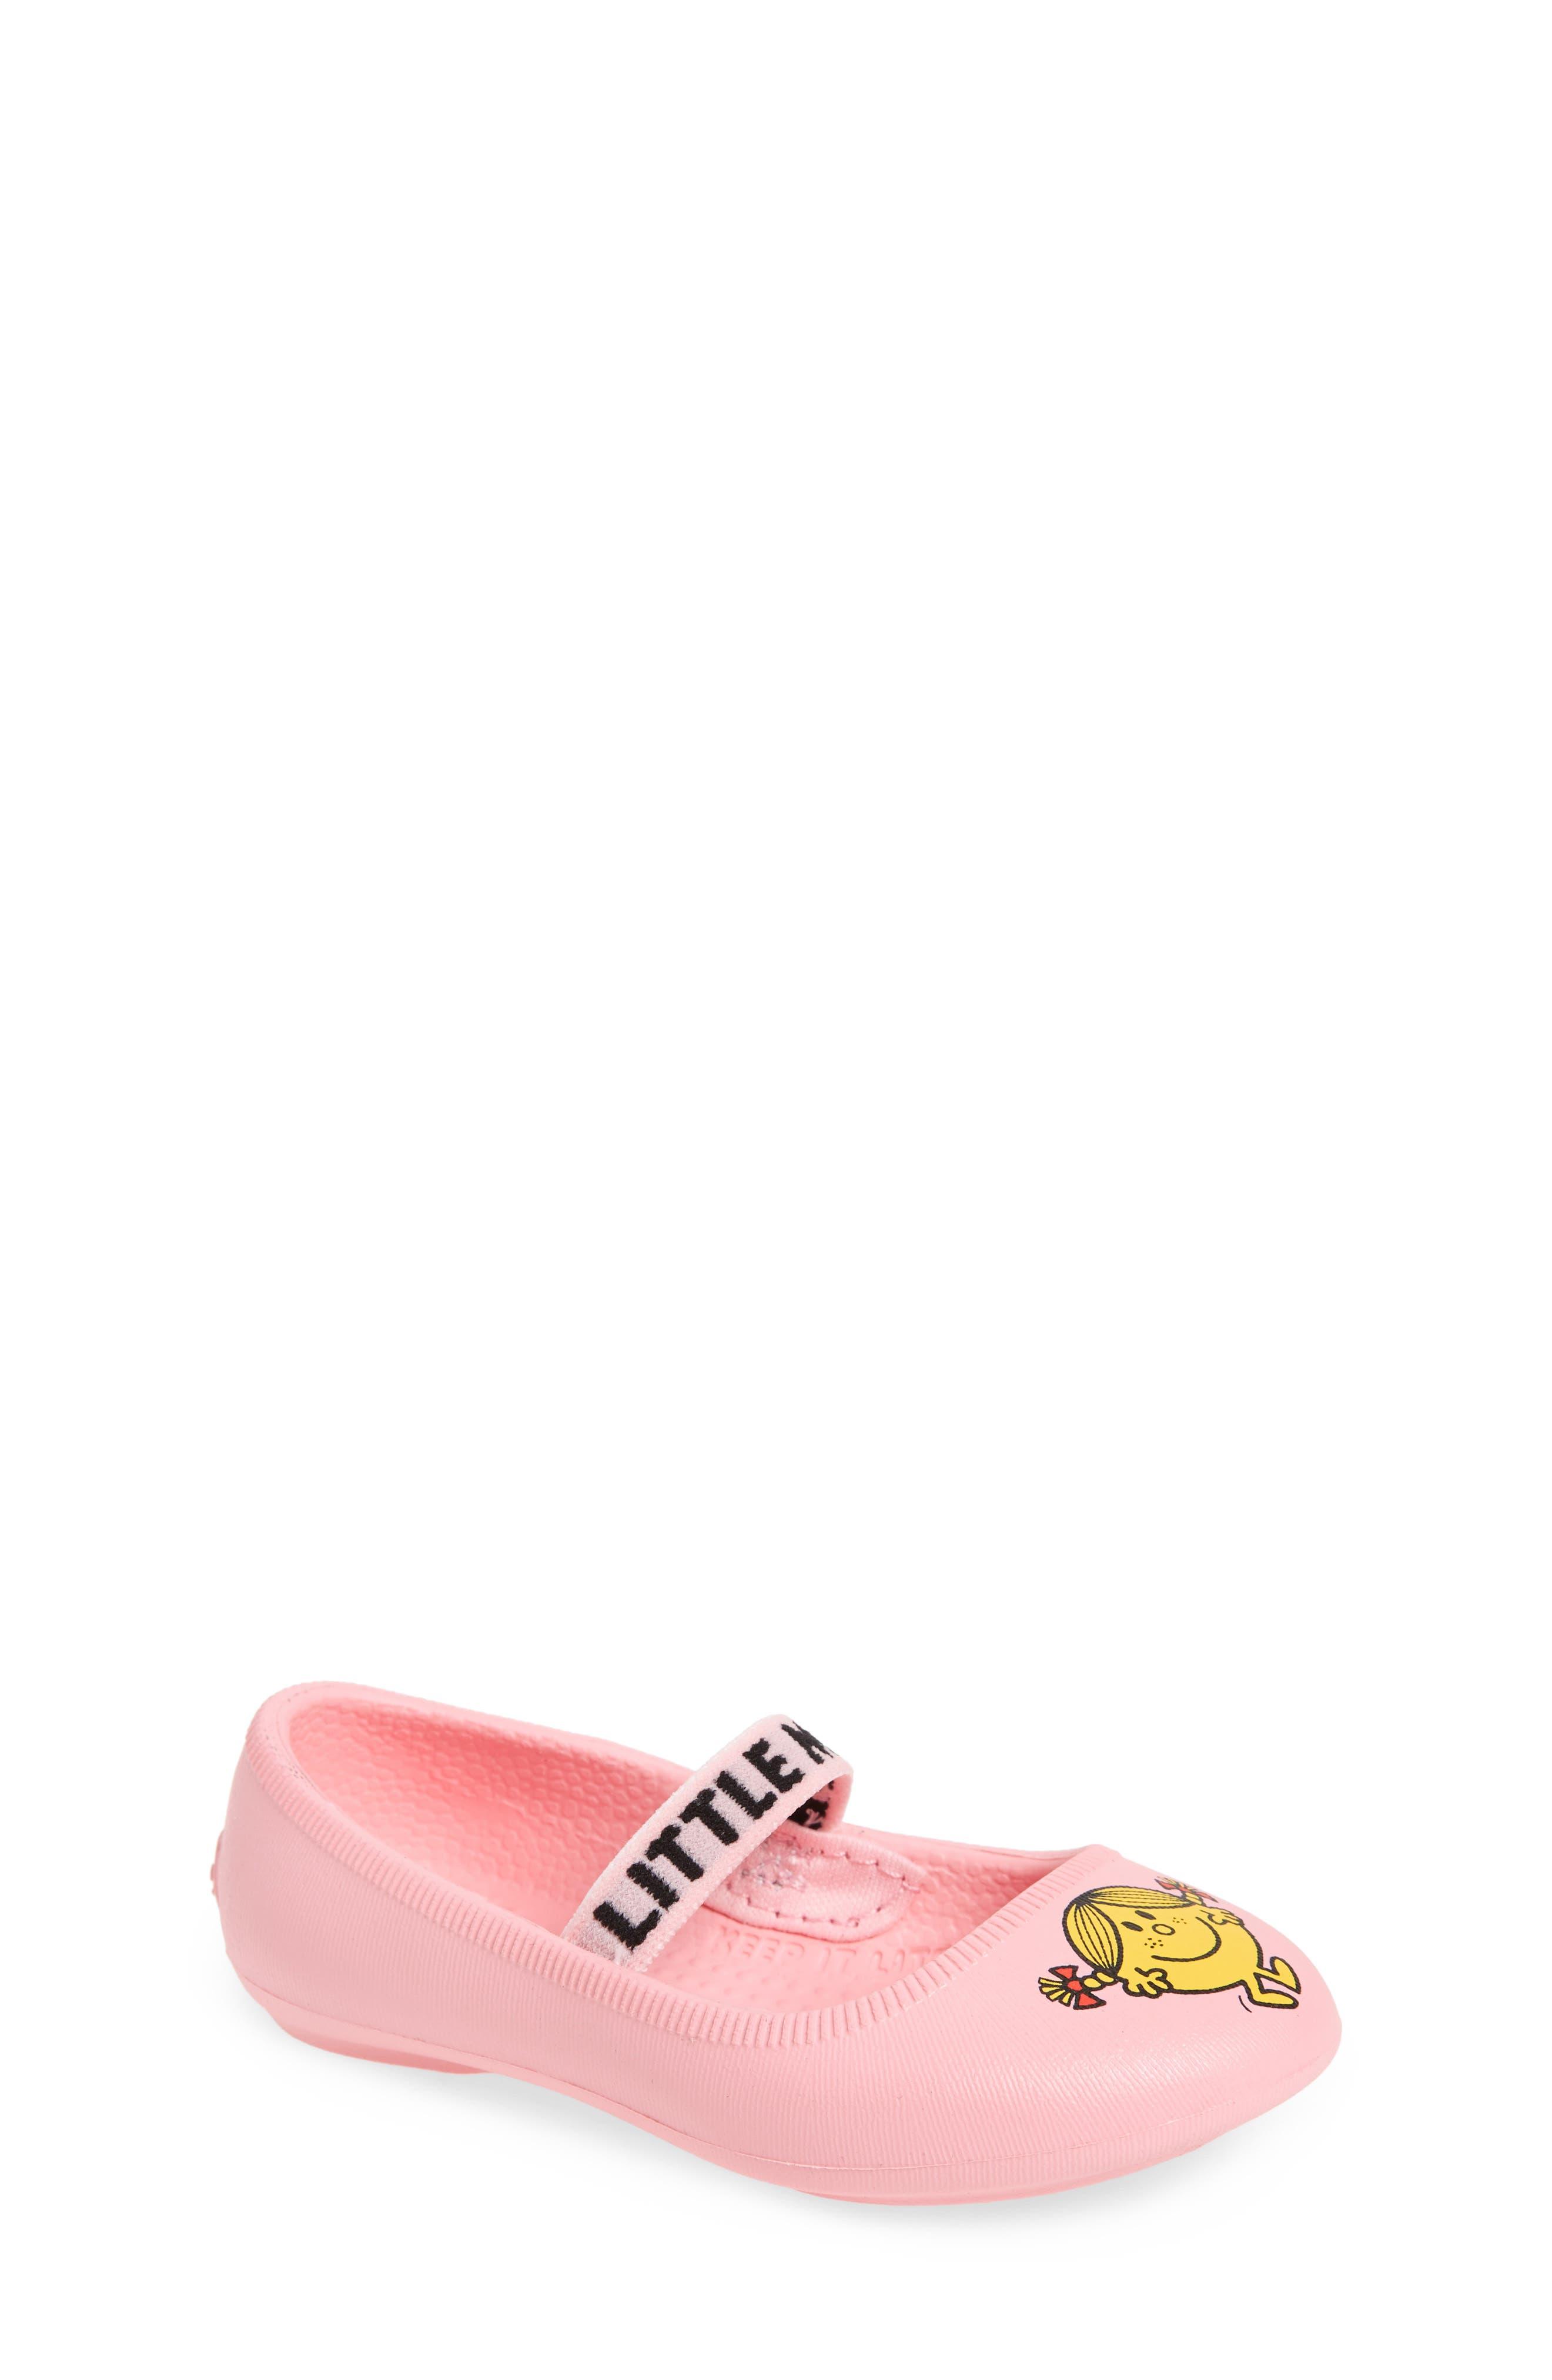 Margot Mary Jane Flat,                             Main thumbnail 1, color,                             Pink/ Little Miss Sunshine